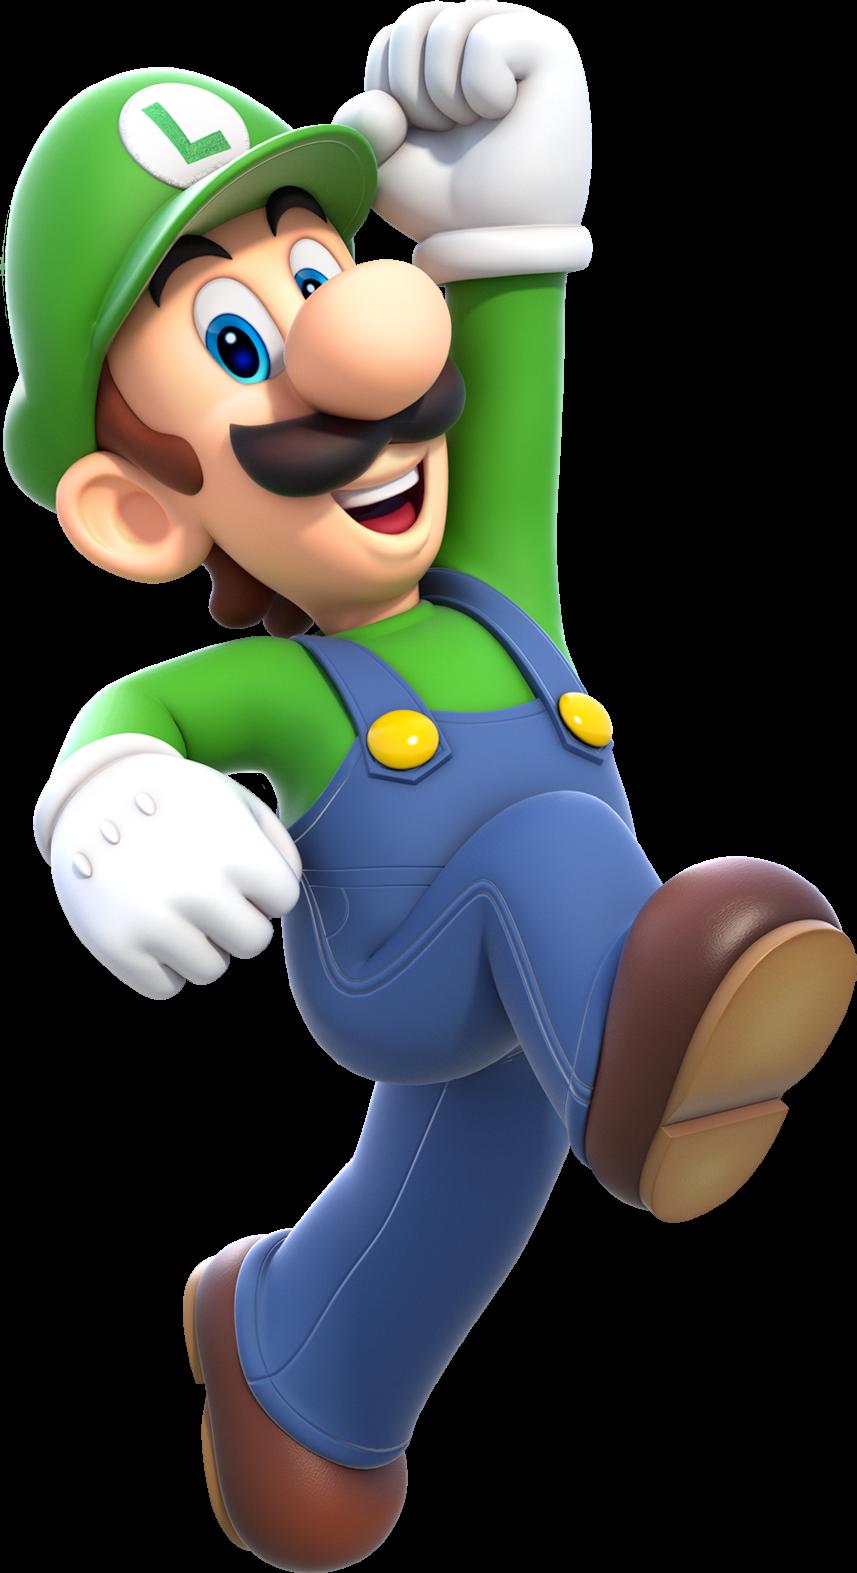 Mario And Luigi PNG - 88715